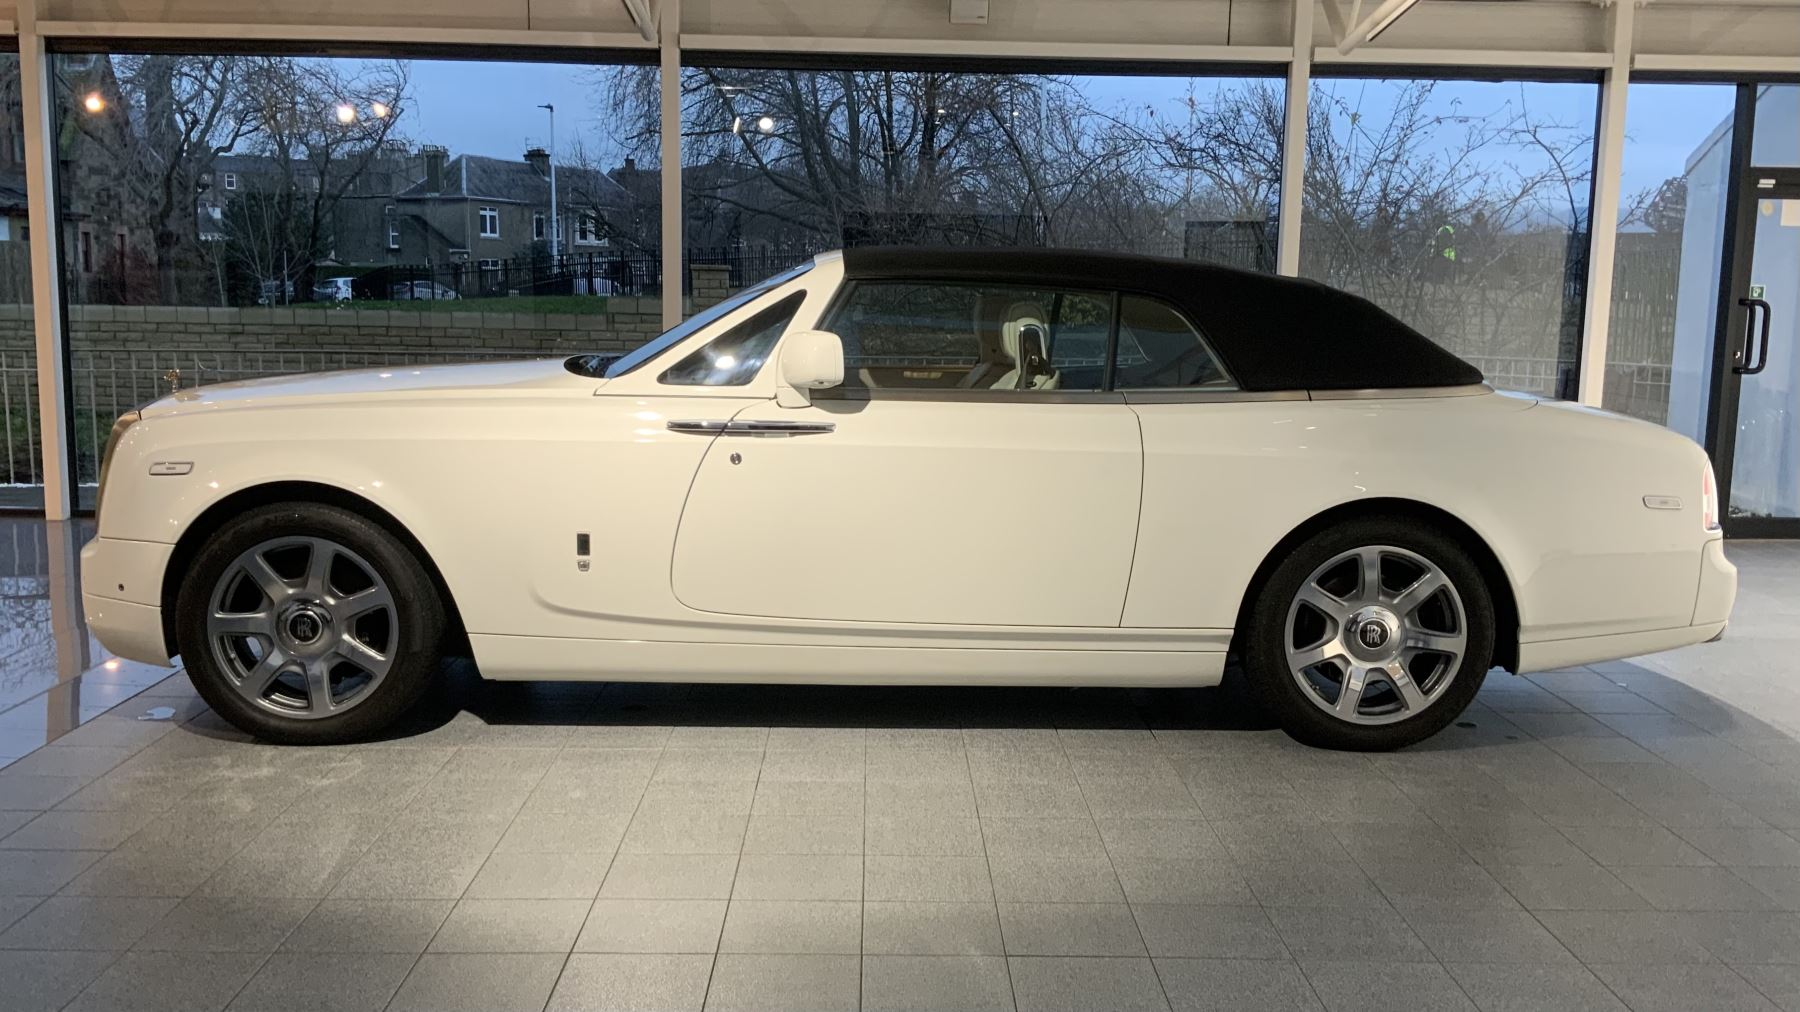 Rolls-Royce Phantom Drophead Coupe Series 2 image 13